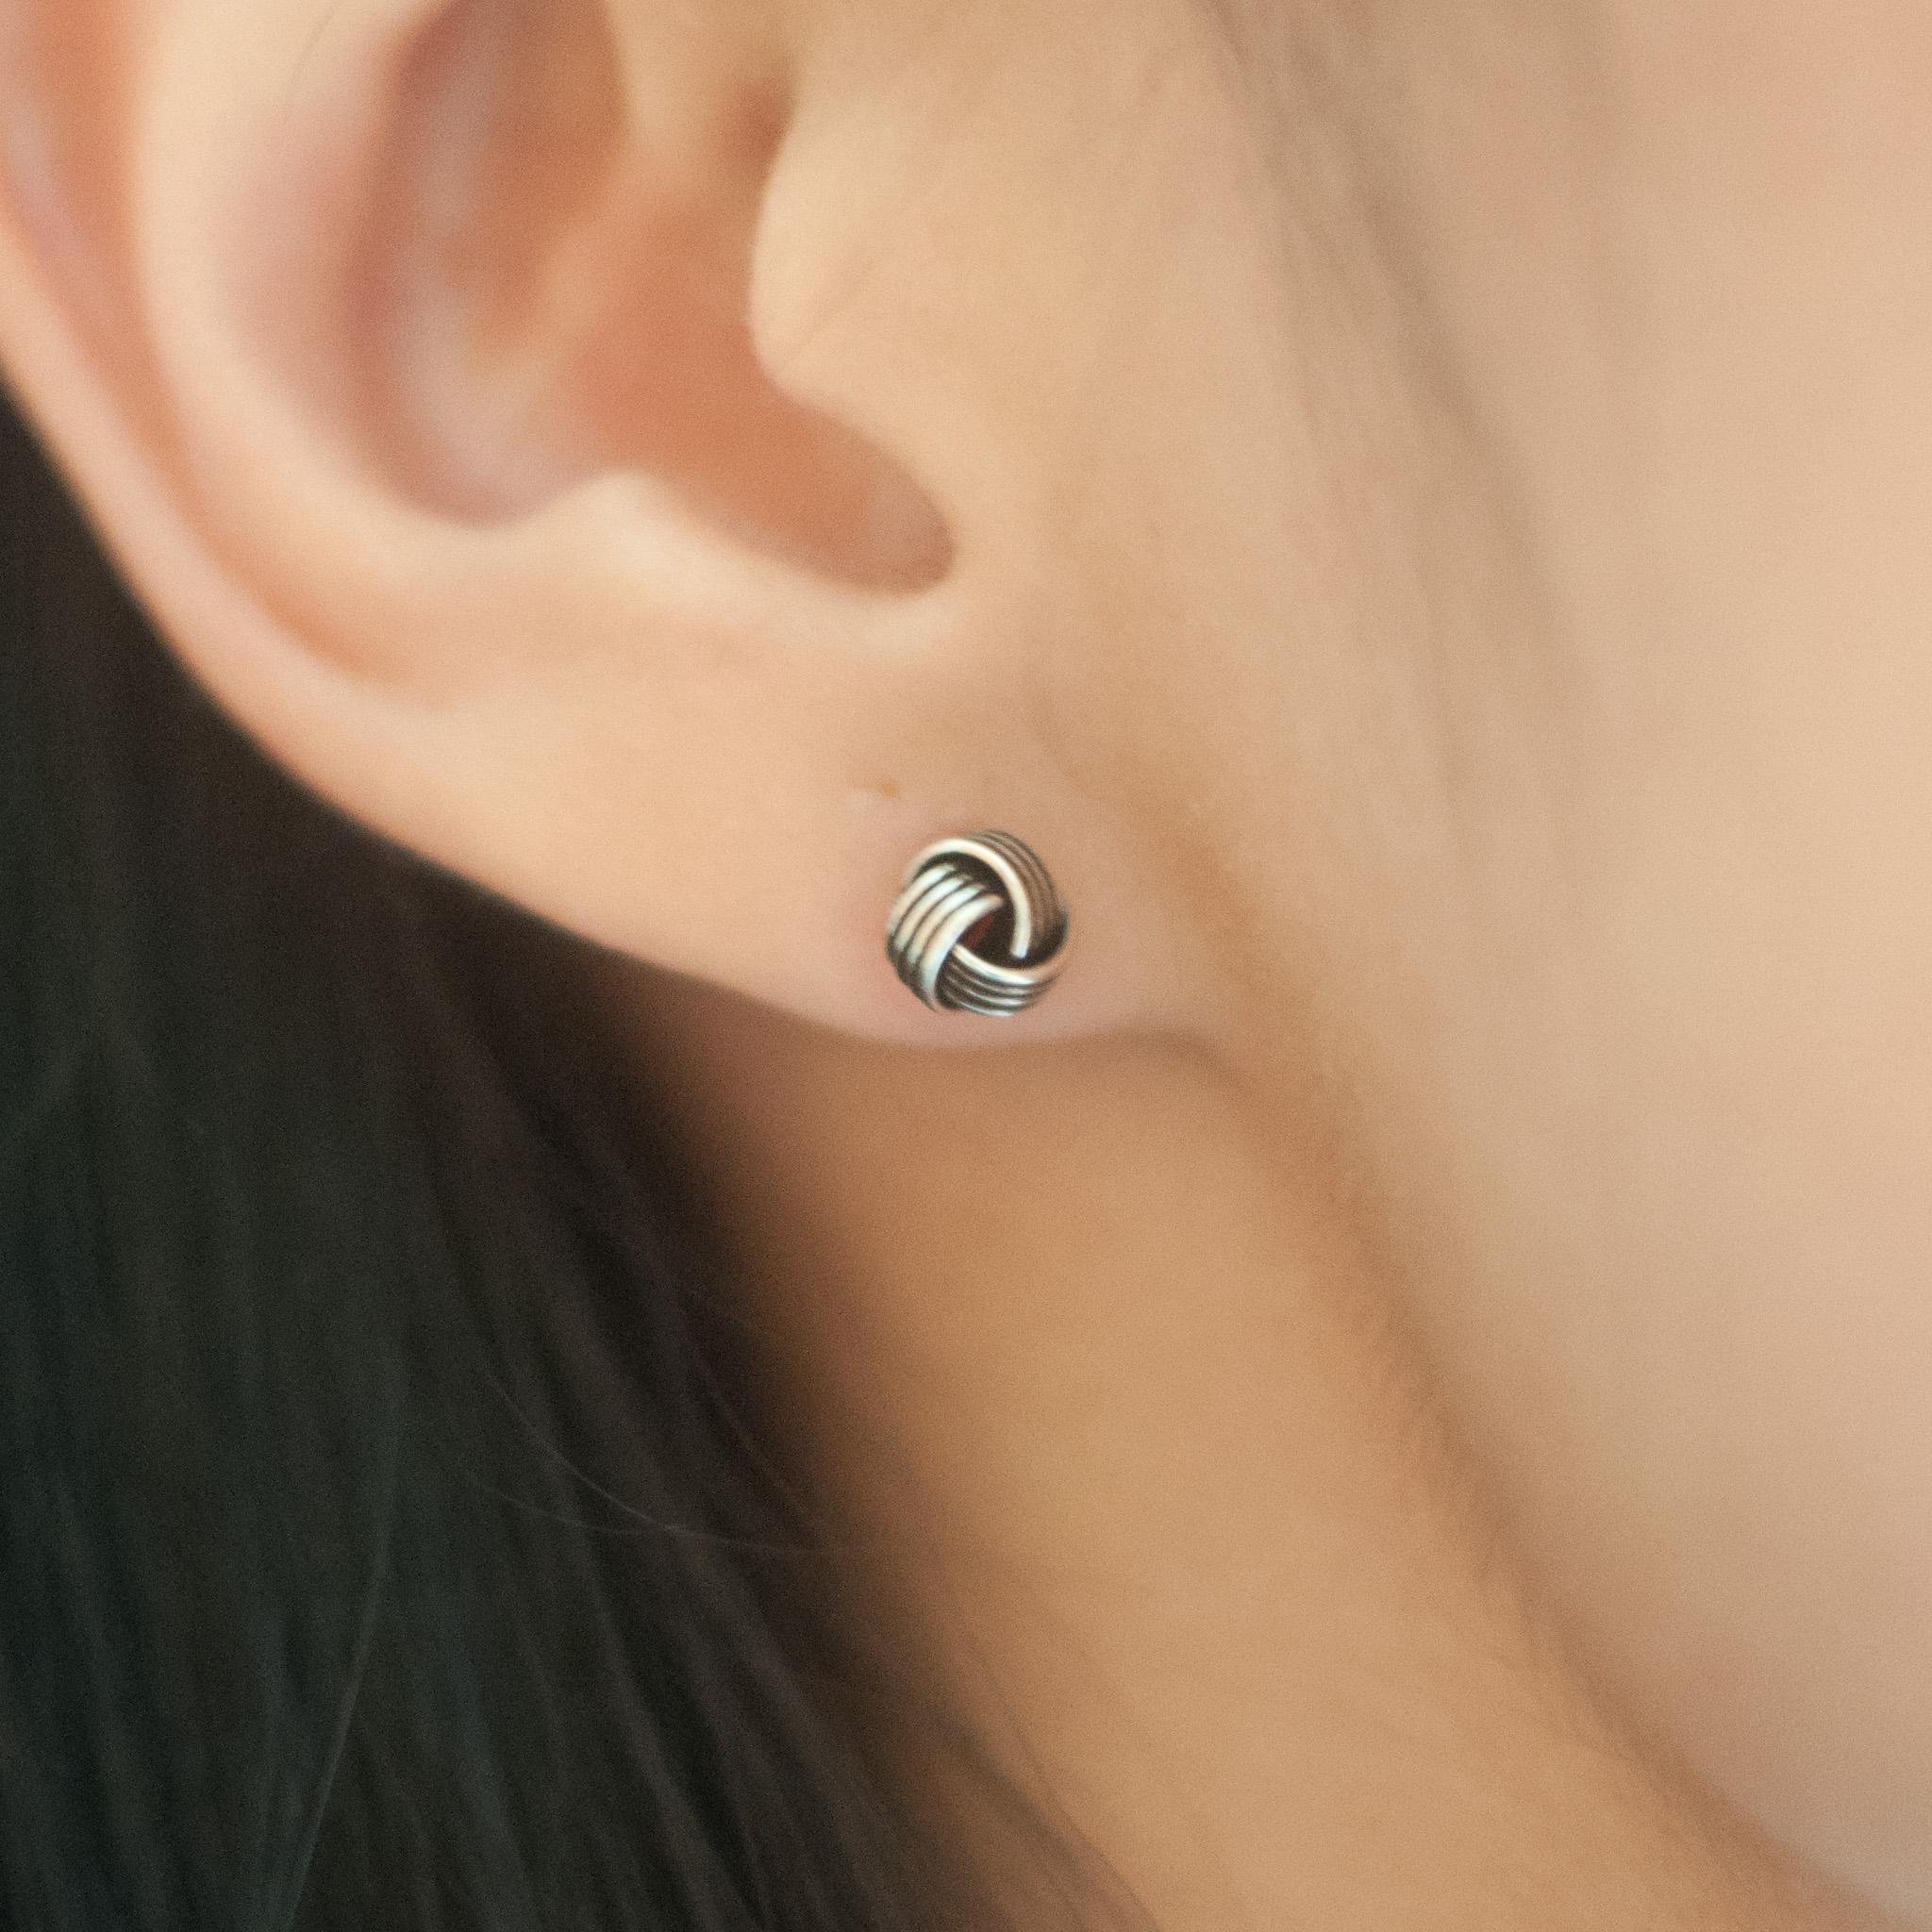 3eba343c4 6mm Knot Silver Metal Stud Earrings Sterling Silver Stud Earrings For Women  Wedding Earrings ER0412